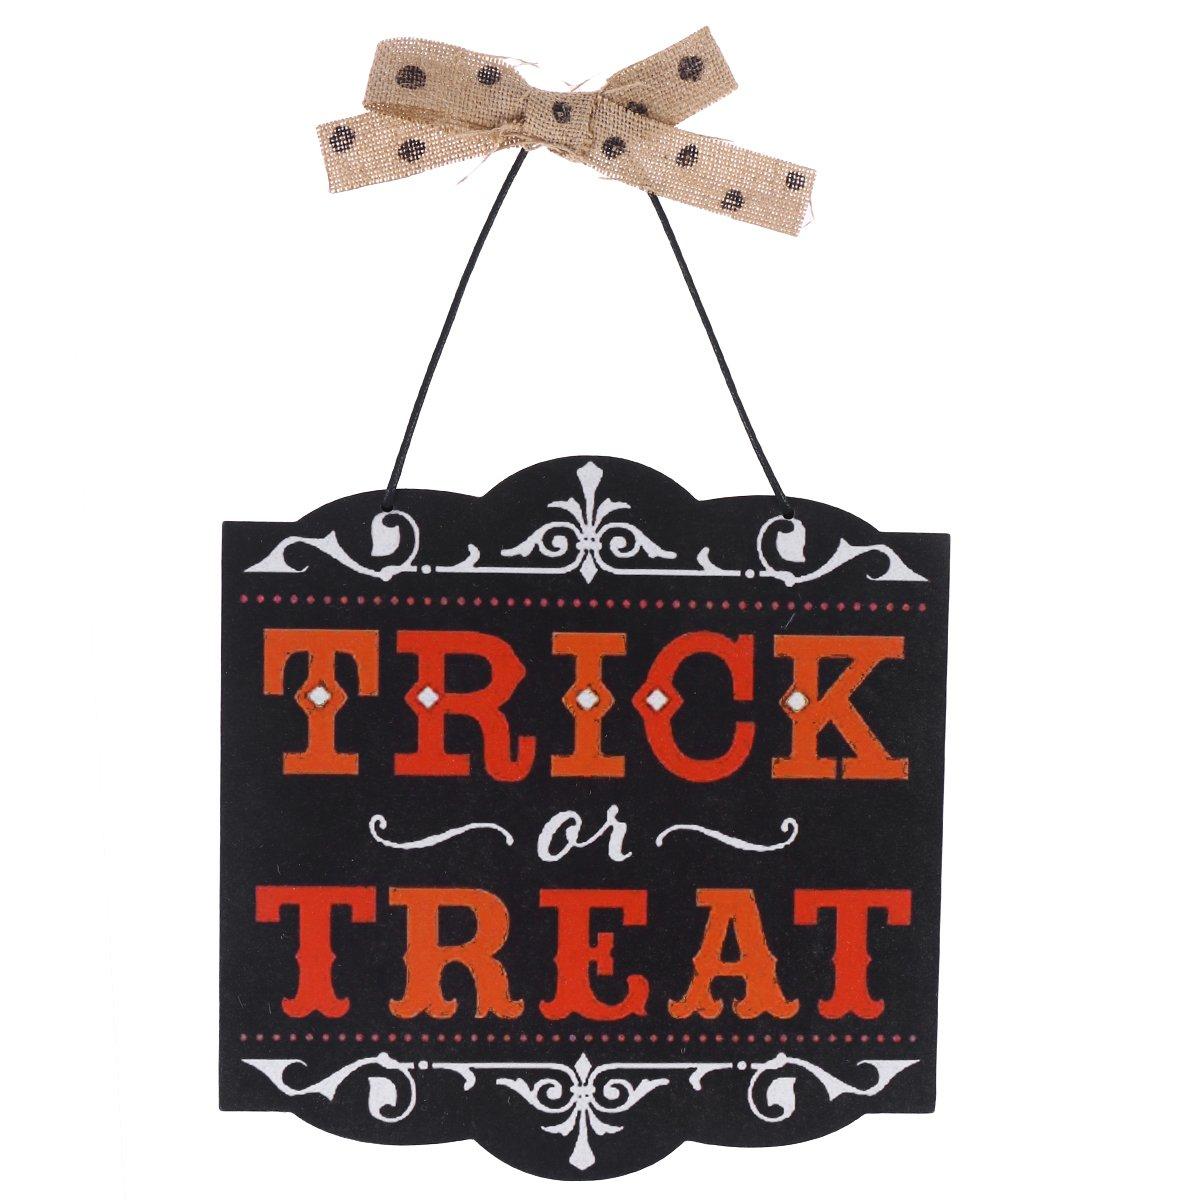 Halloween Decorative Plasuge Vintage Style Wooden Hanging Door Wall Plaque Holiday Hanging Sign - Treat or Trick